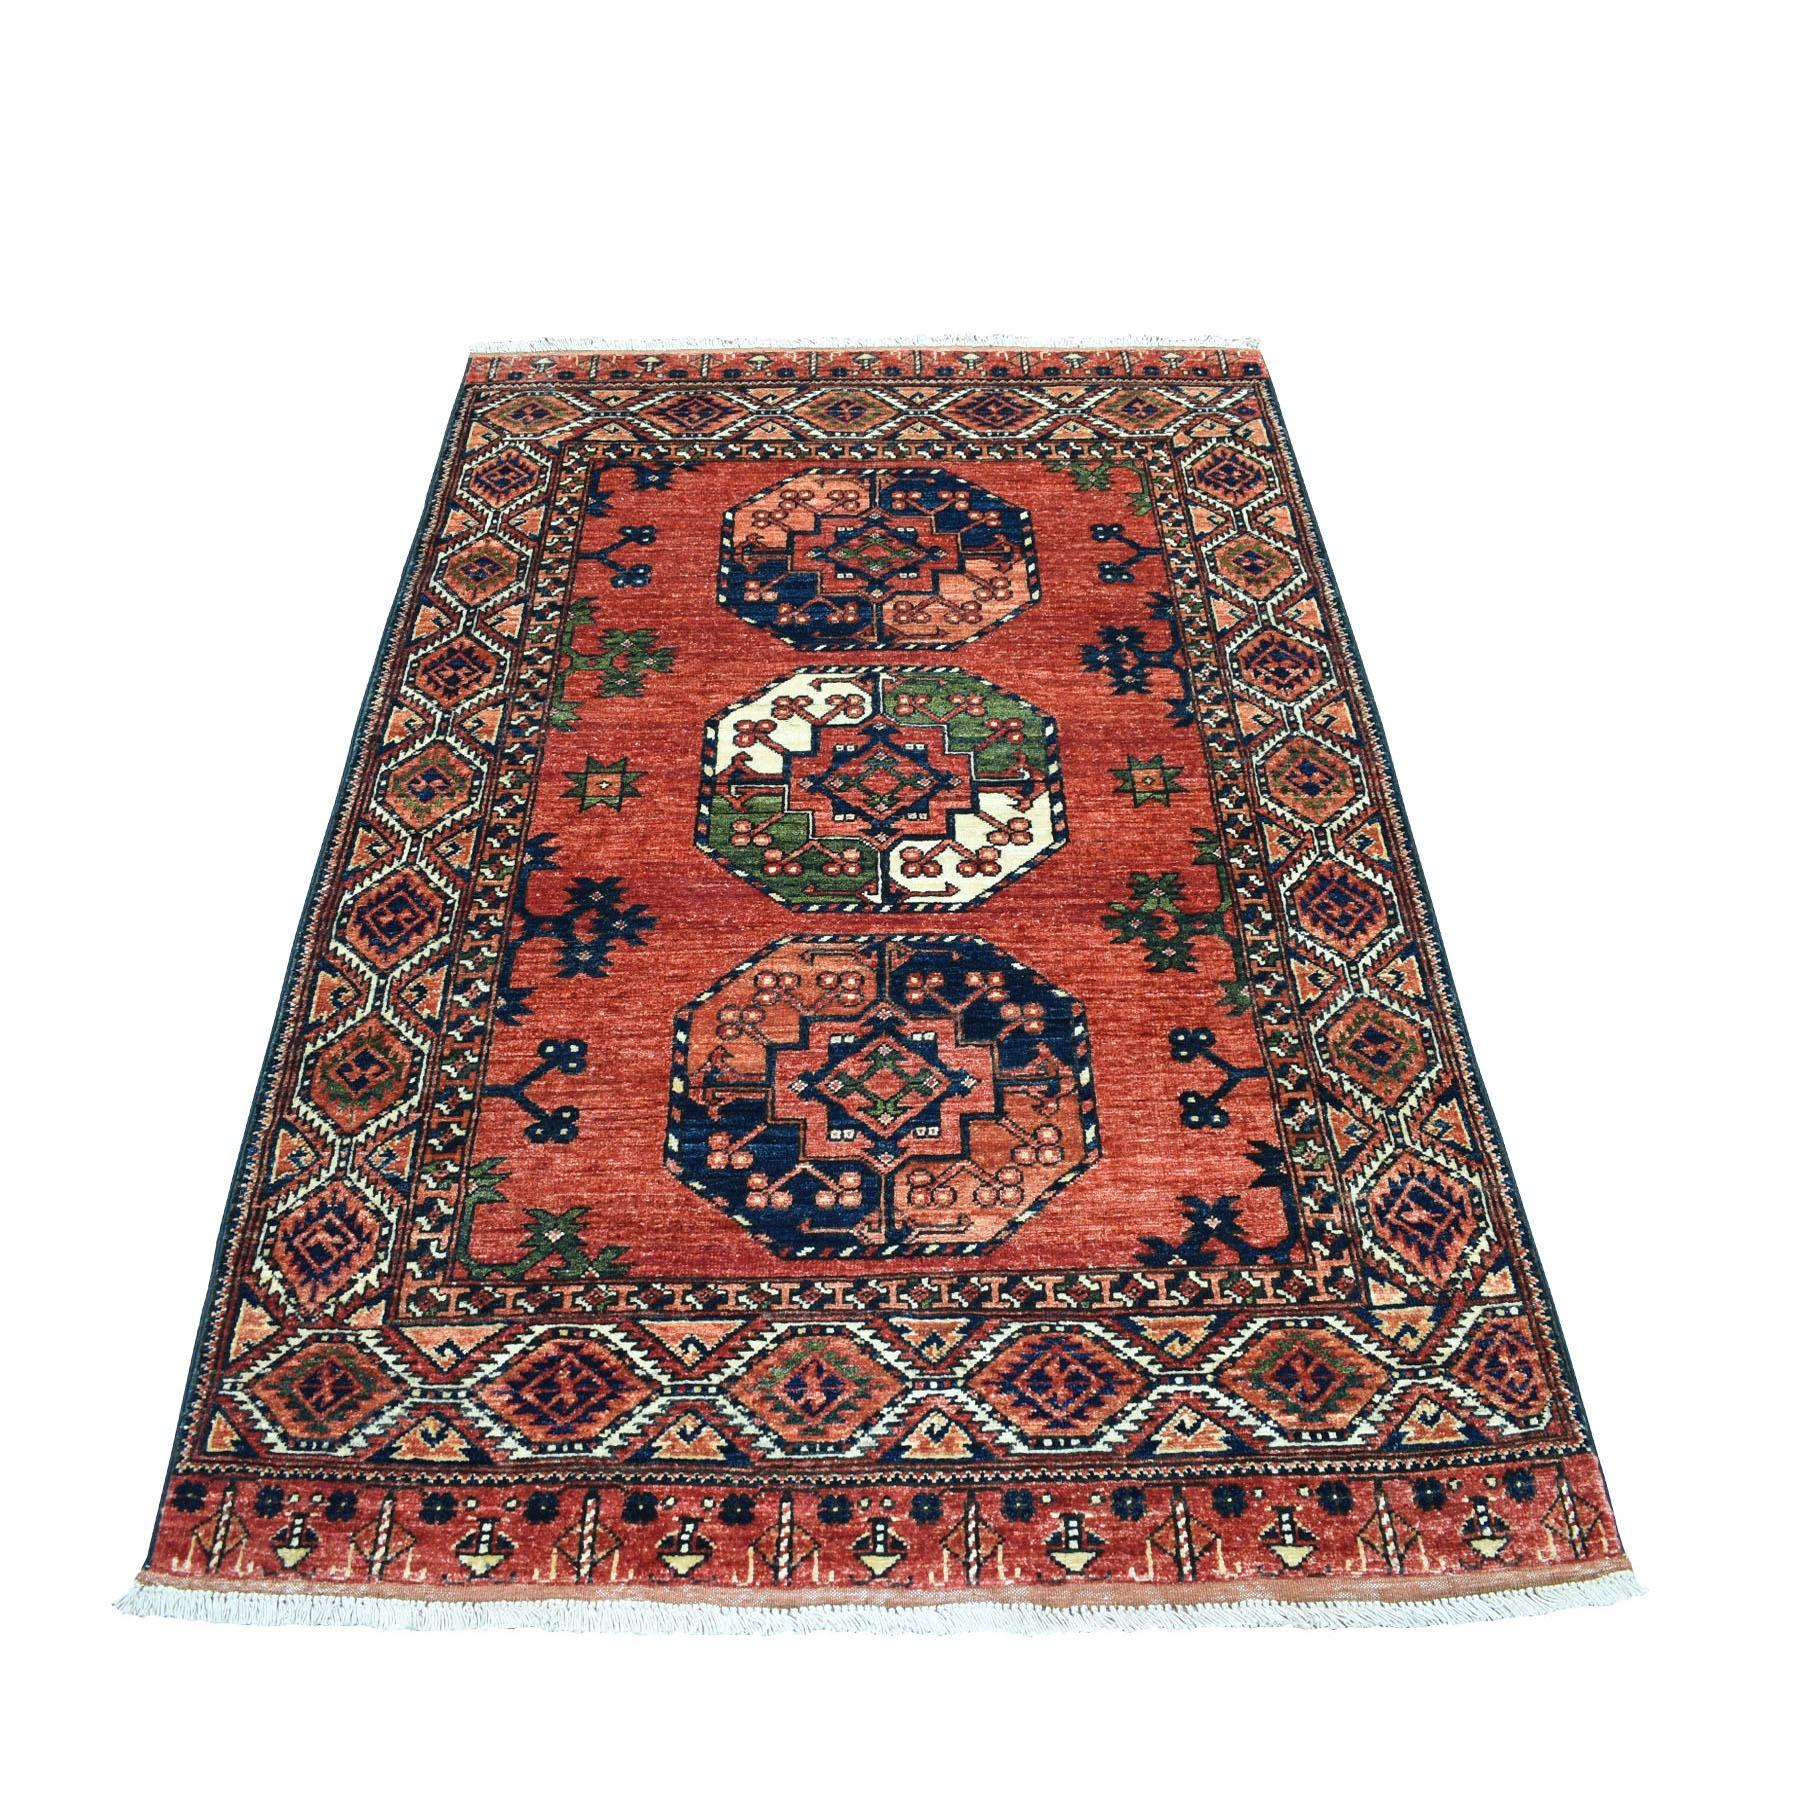 4'x6' Red Afghan Turkoman Ersari Elephant Feet Design Pure Wool Hand Knotted Oriental Rug 53131